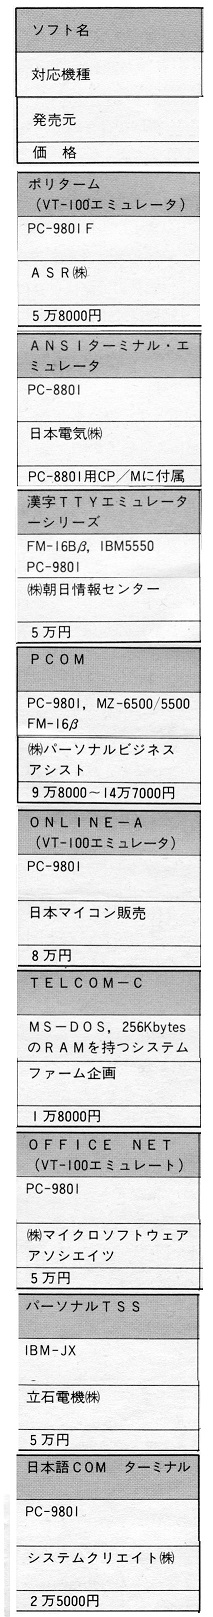 ASCII1985(09)c02ネットワーク表4_ターミナルソフトウェアの仕様W213.jpg